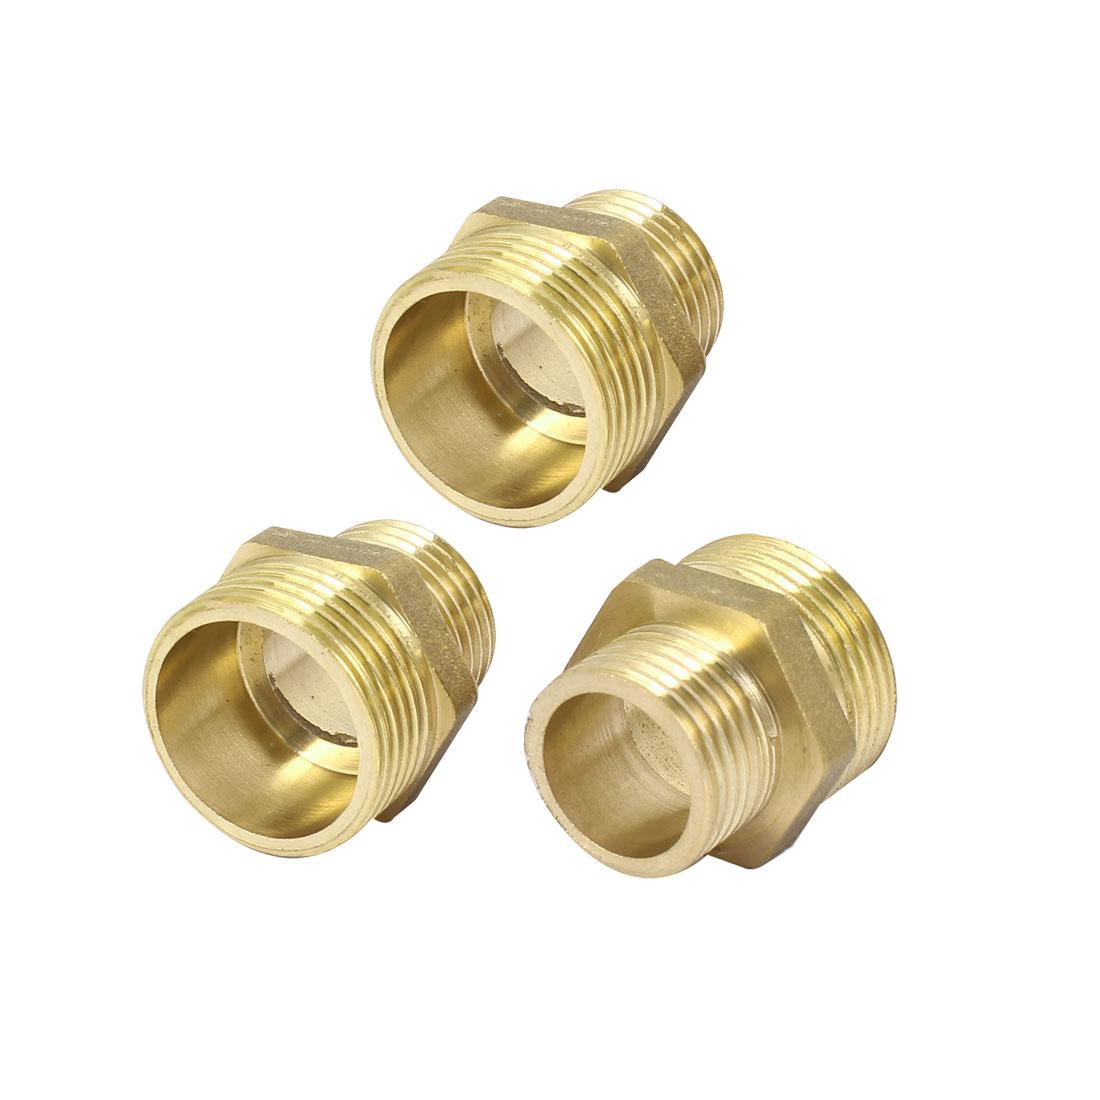 Pipe Fitting Male Metal Hex Reducing Nipple Brass Tone 3pcs